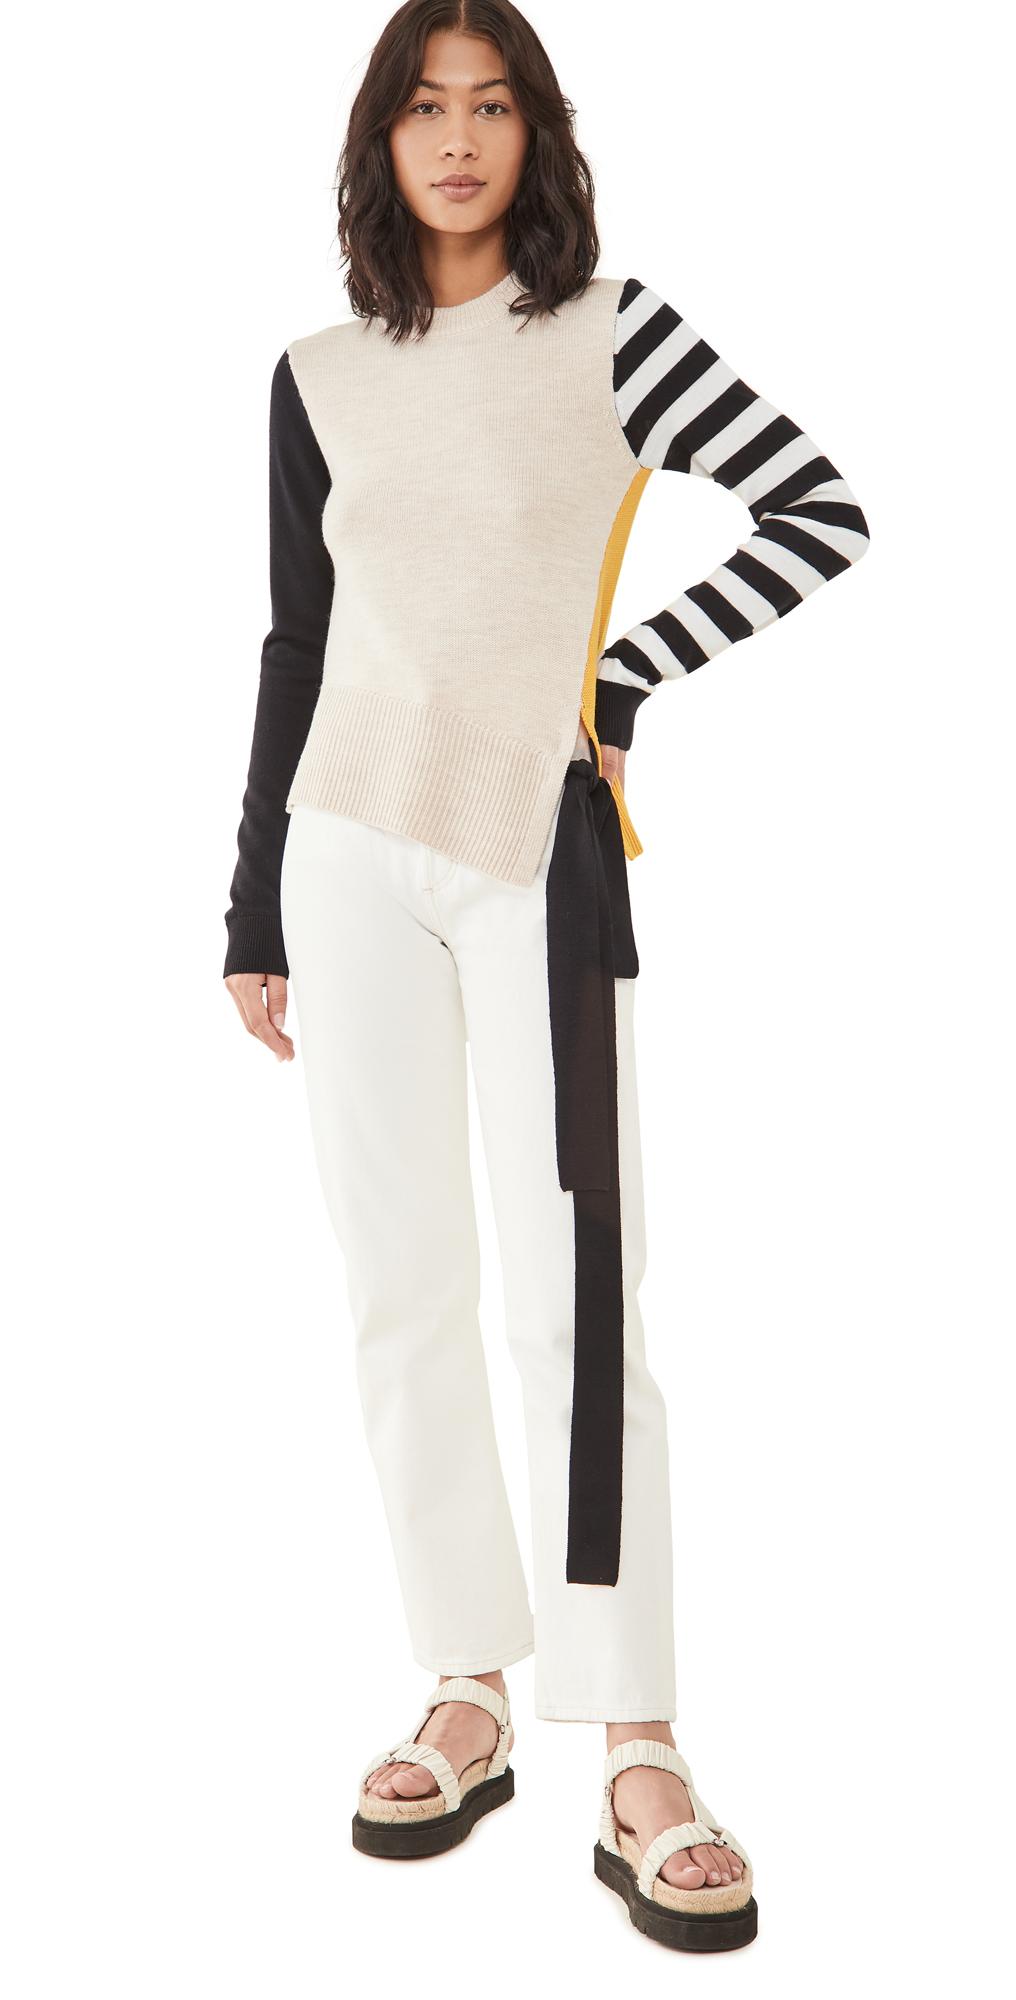 Monse Stripe Sleeve Colorblock Knit Top